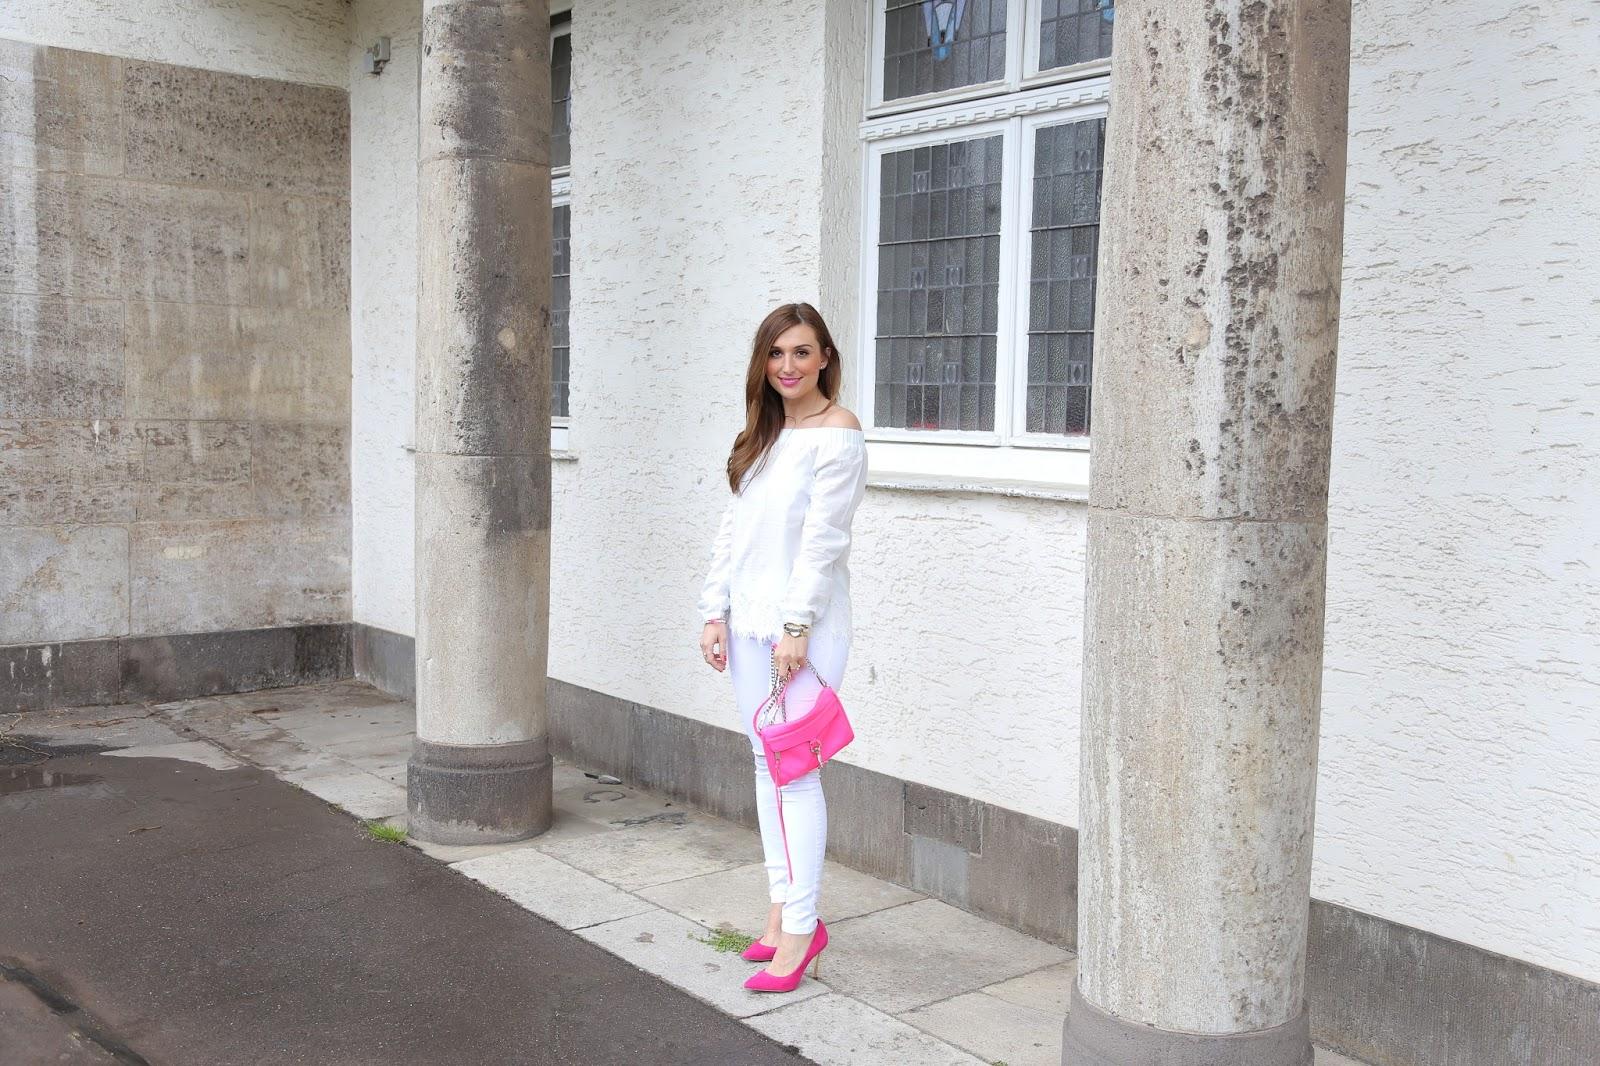 Fashionstylebyjohanna - StreetOne - Peter Kaier - RebeccaMinkoff- Mini Bag Rebecca Mincoff - Pinke Tasche  - Weiße Hose